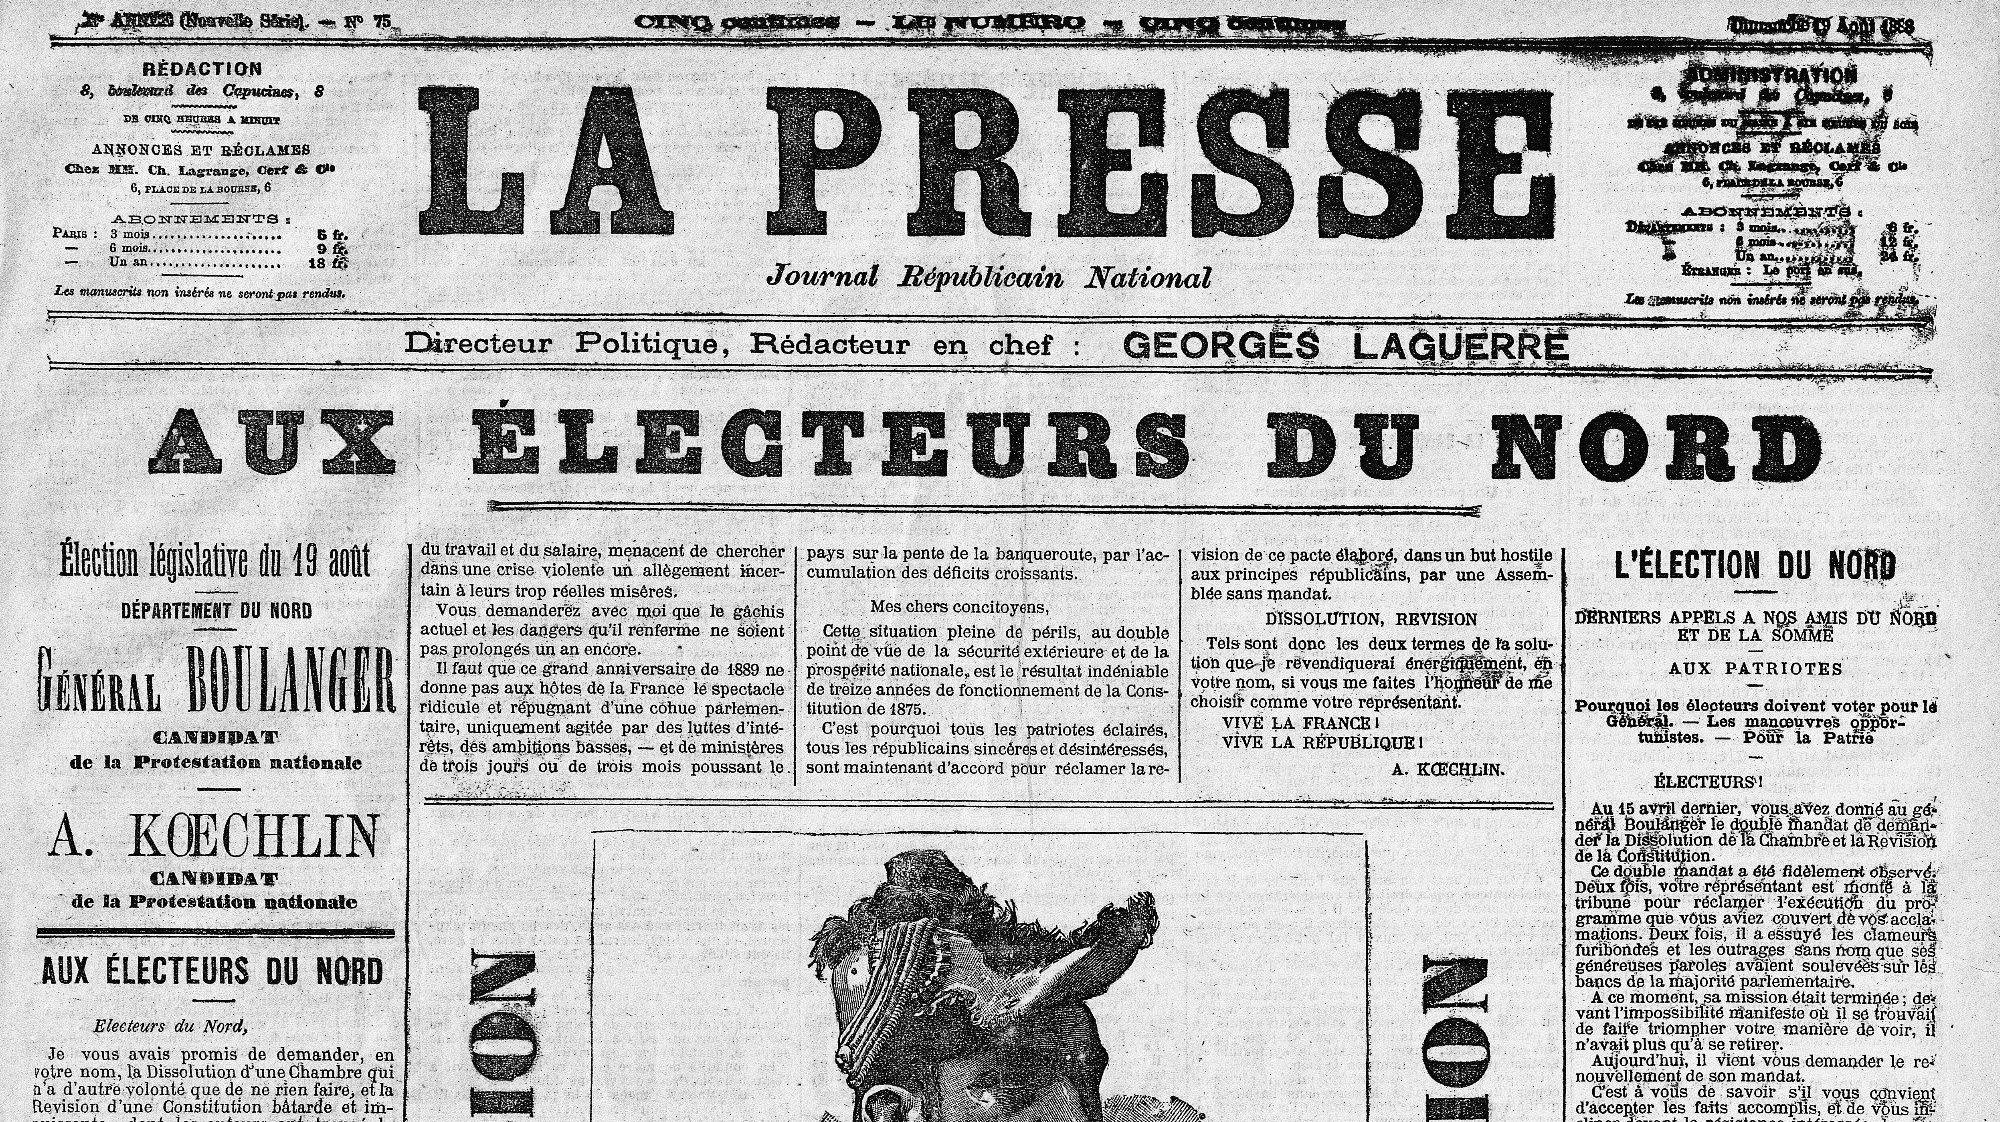 Выпуск газеты La Presse за август 1888 года